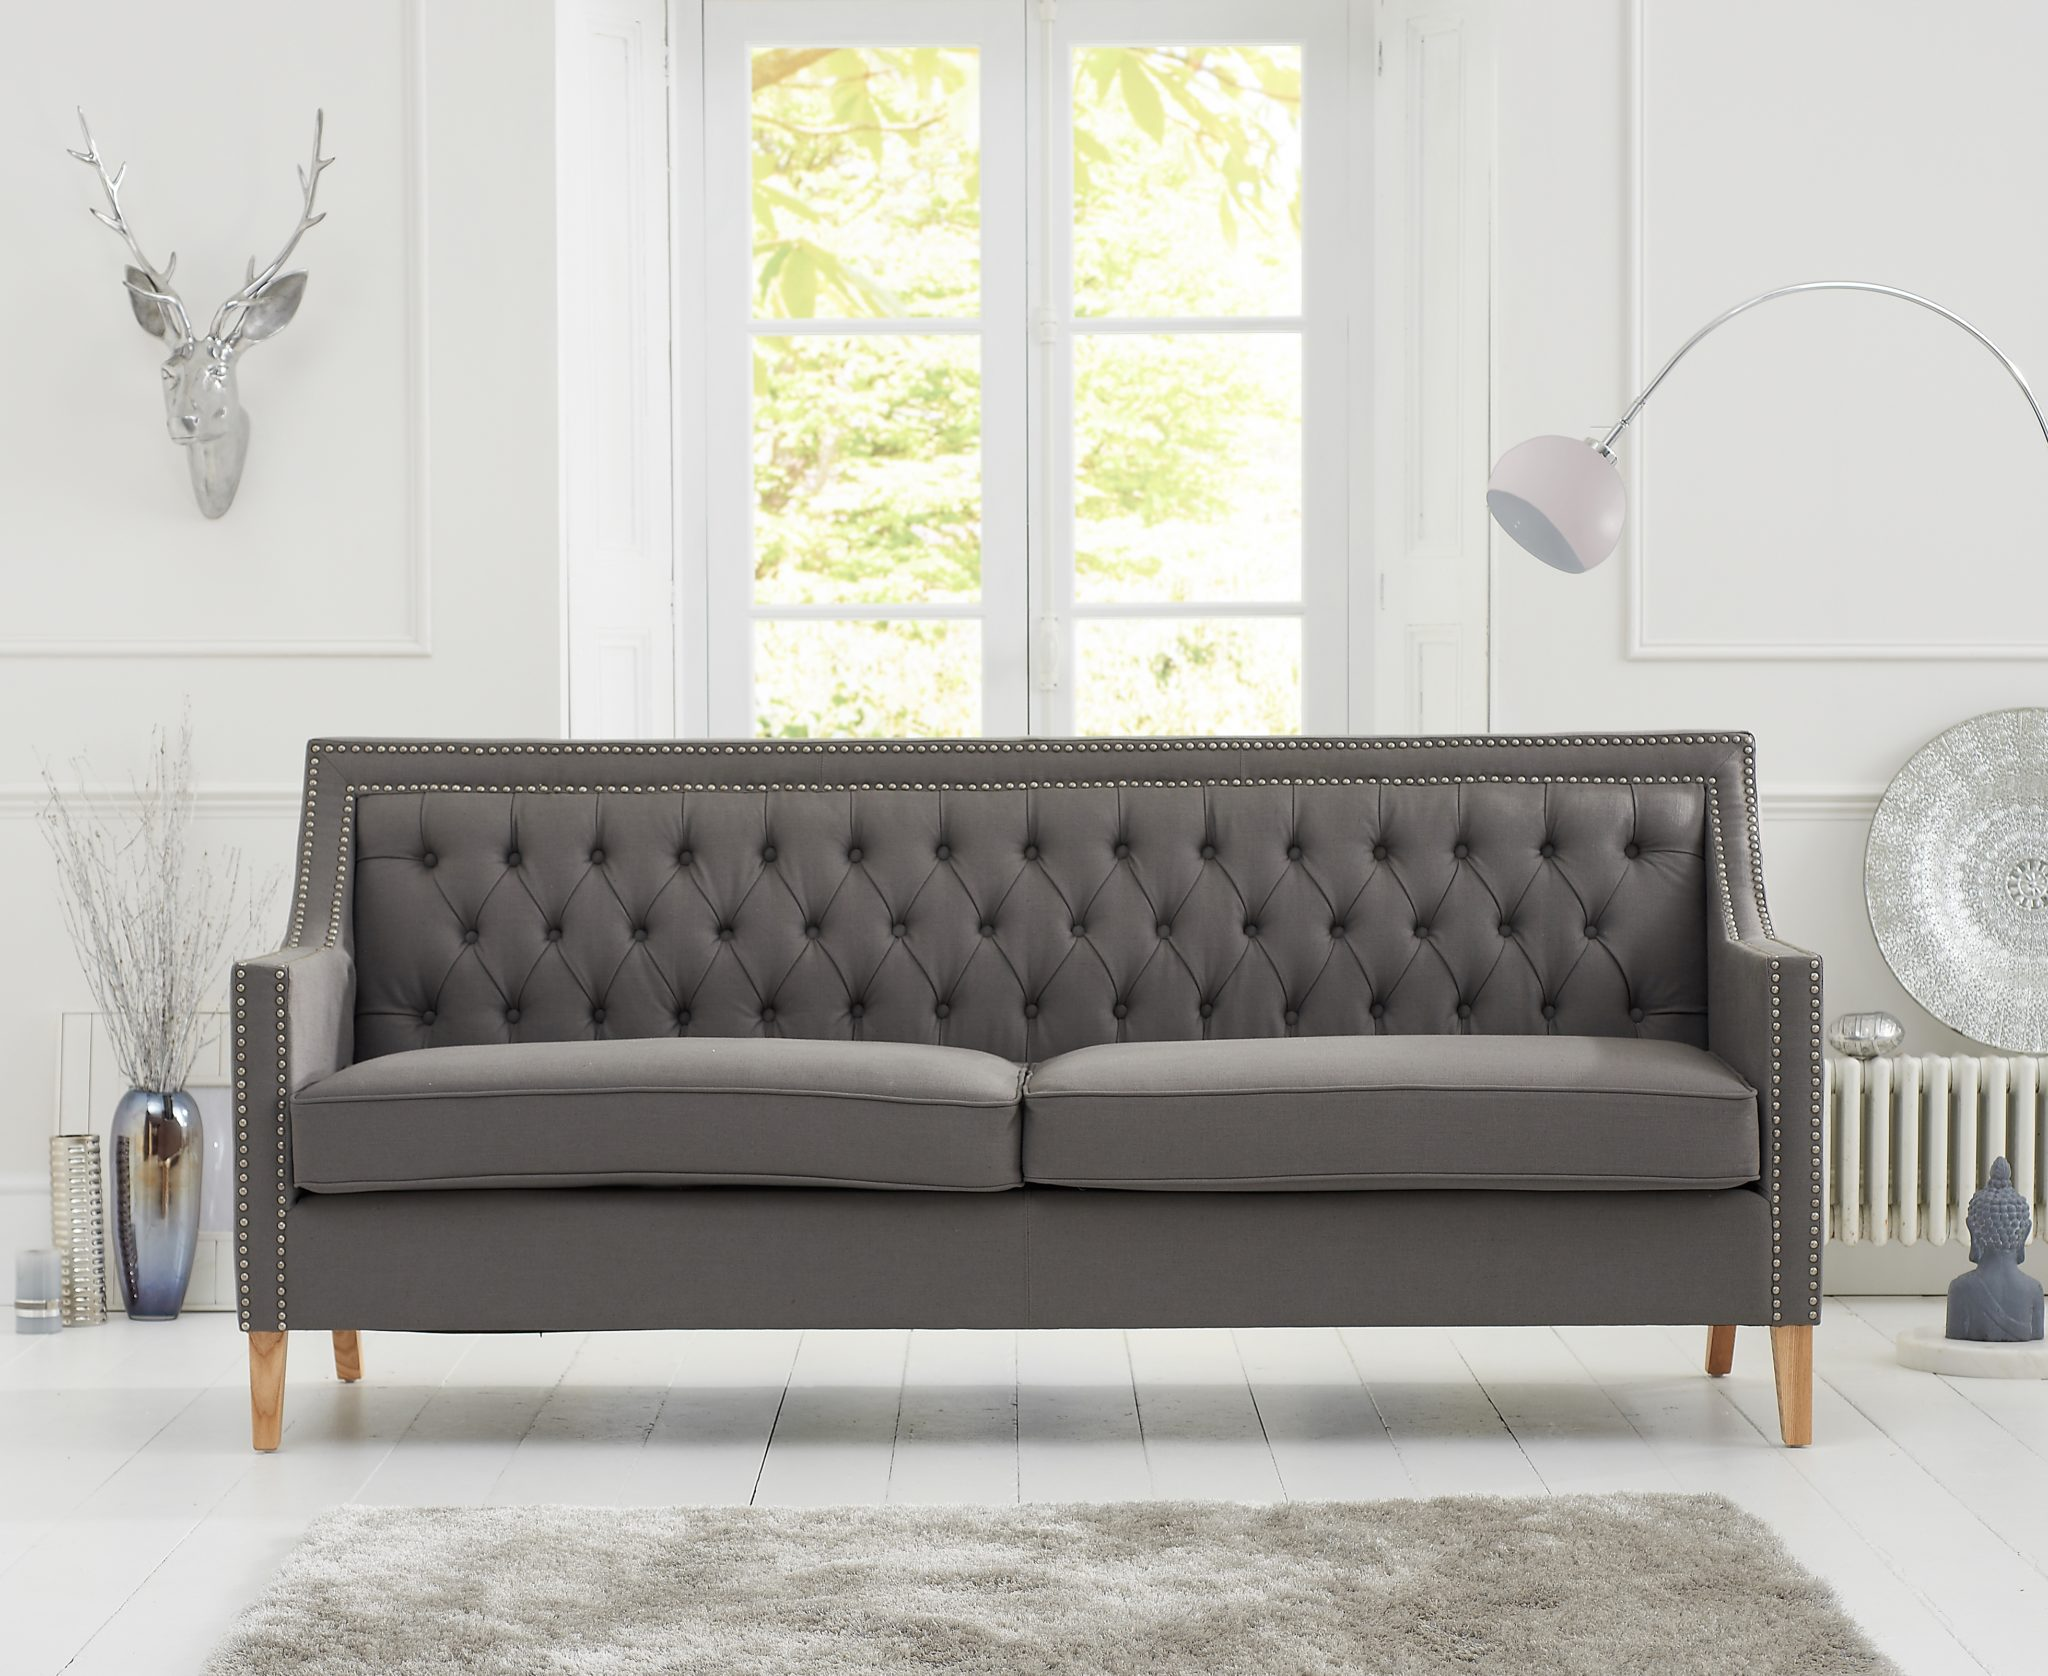 Chesterfield Casa Bella Grey Fabric 3 Seater Sofa Natural Ash Wood Legs